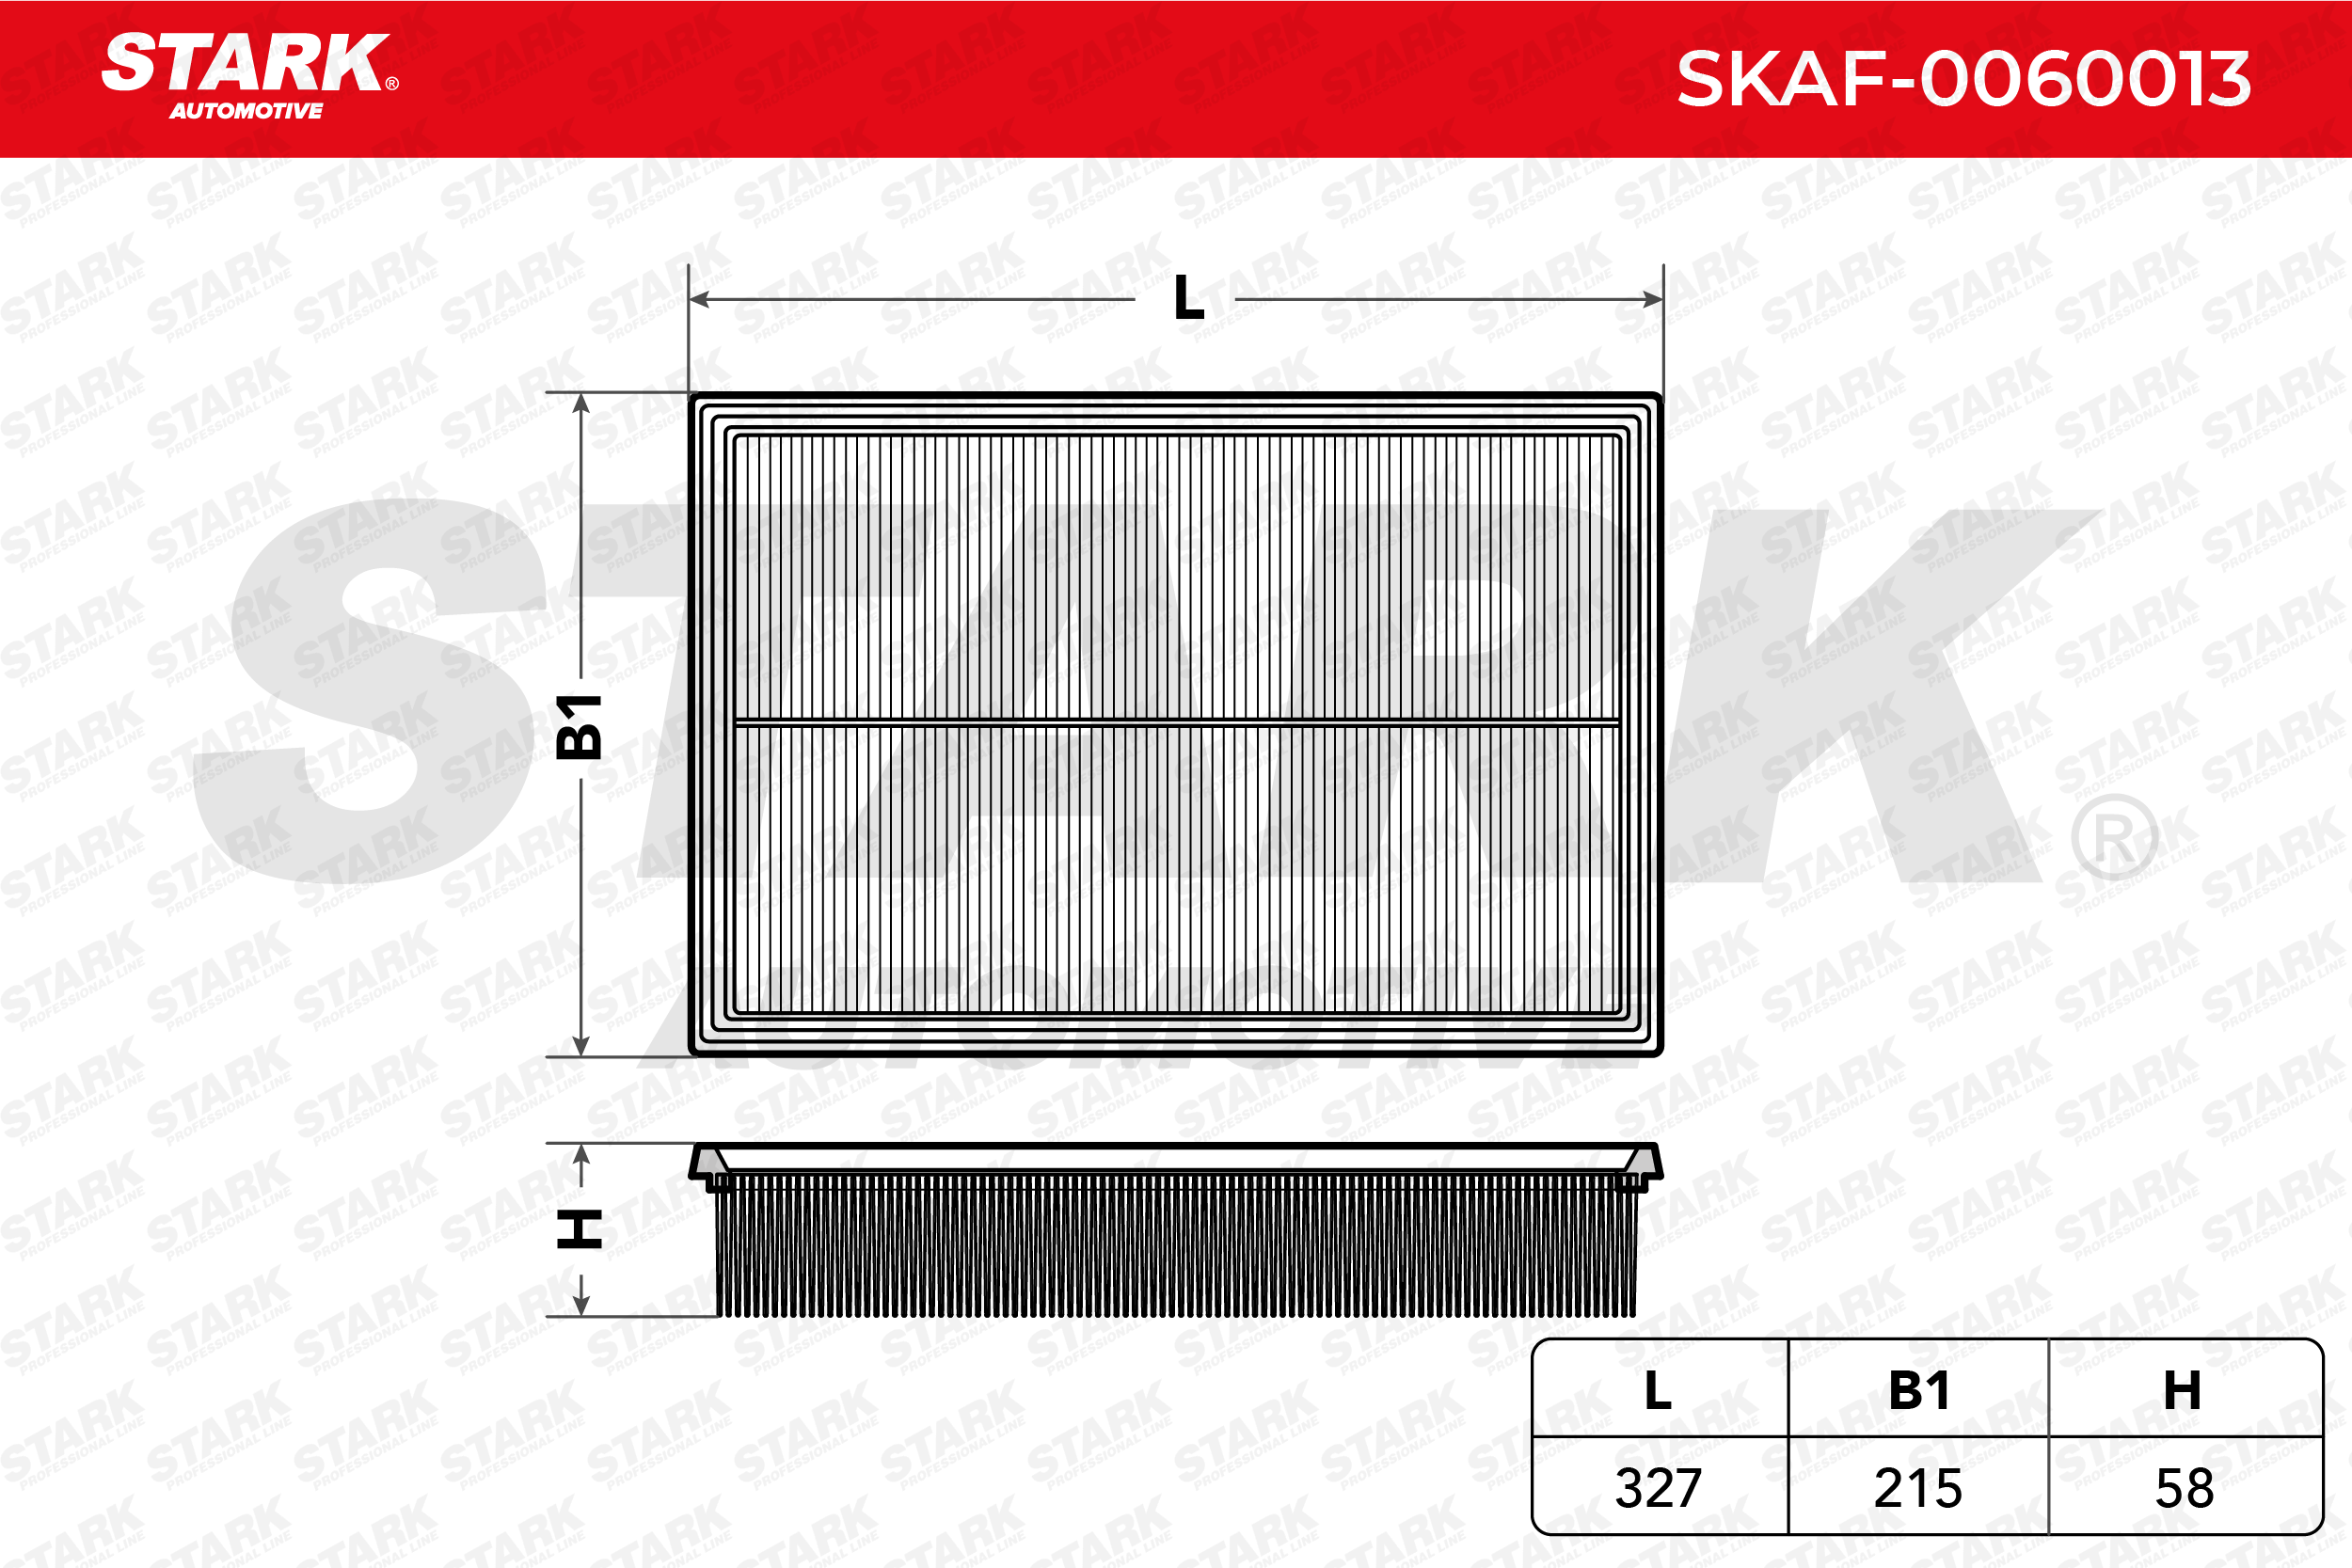 Article № SKAF-0060013 STARK prices